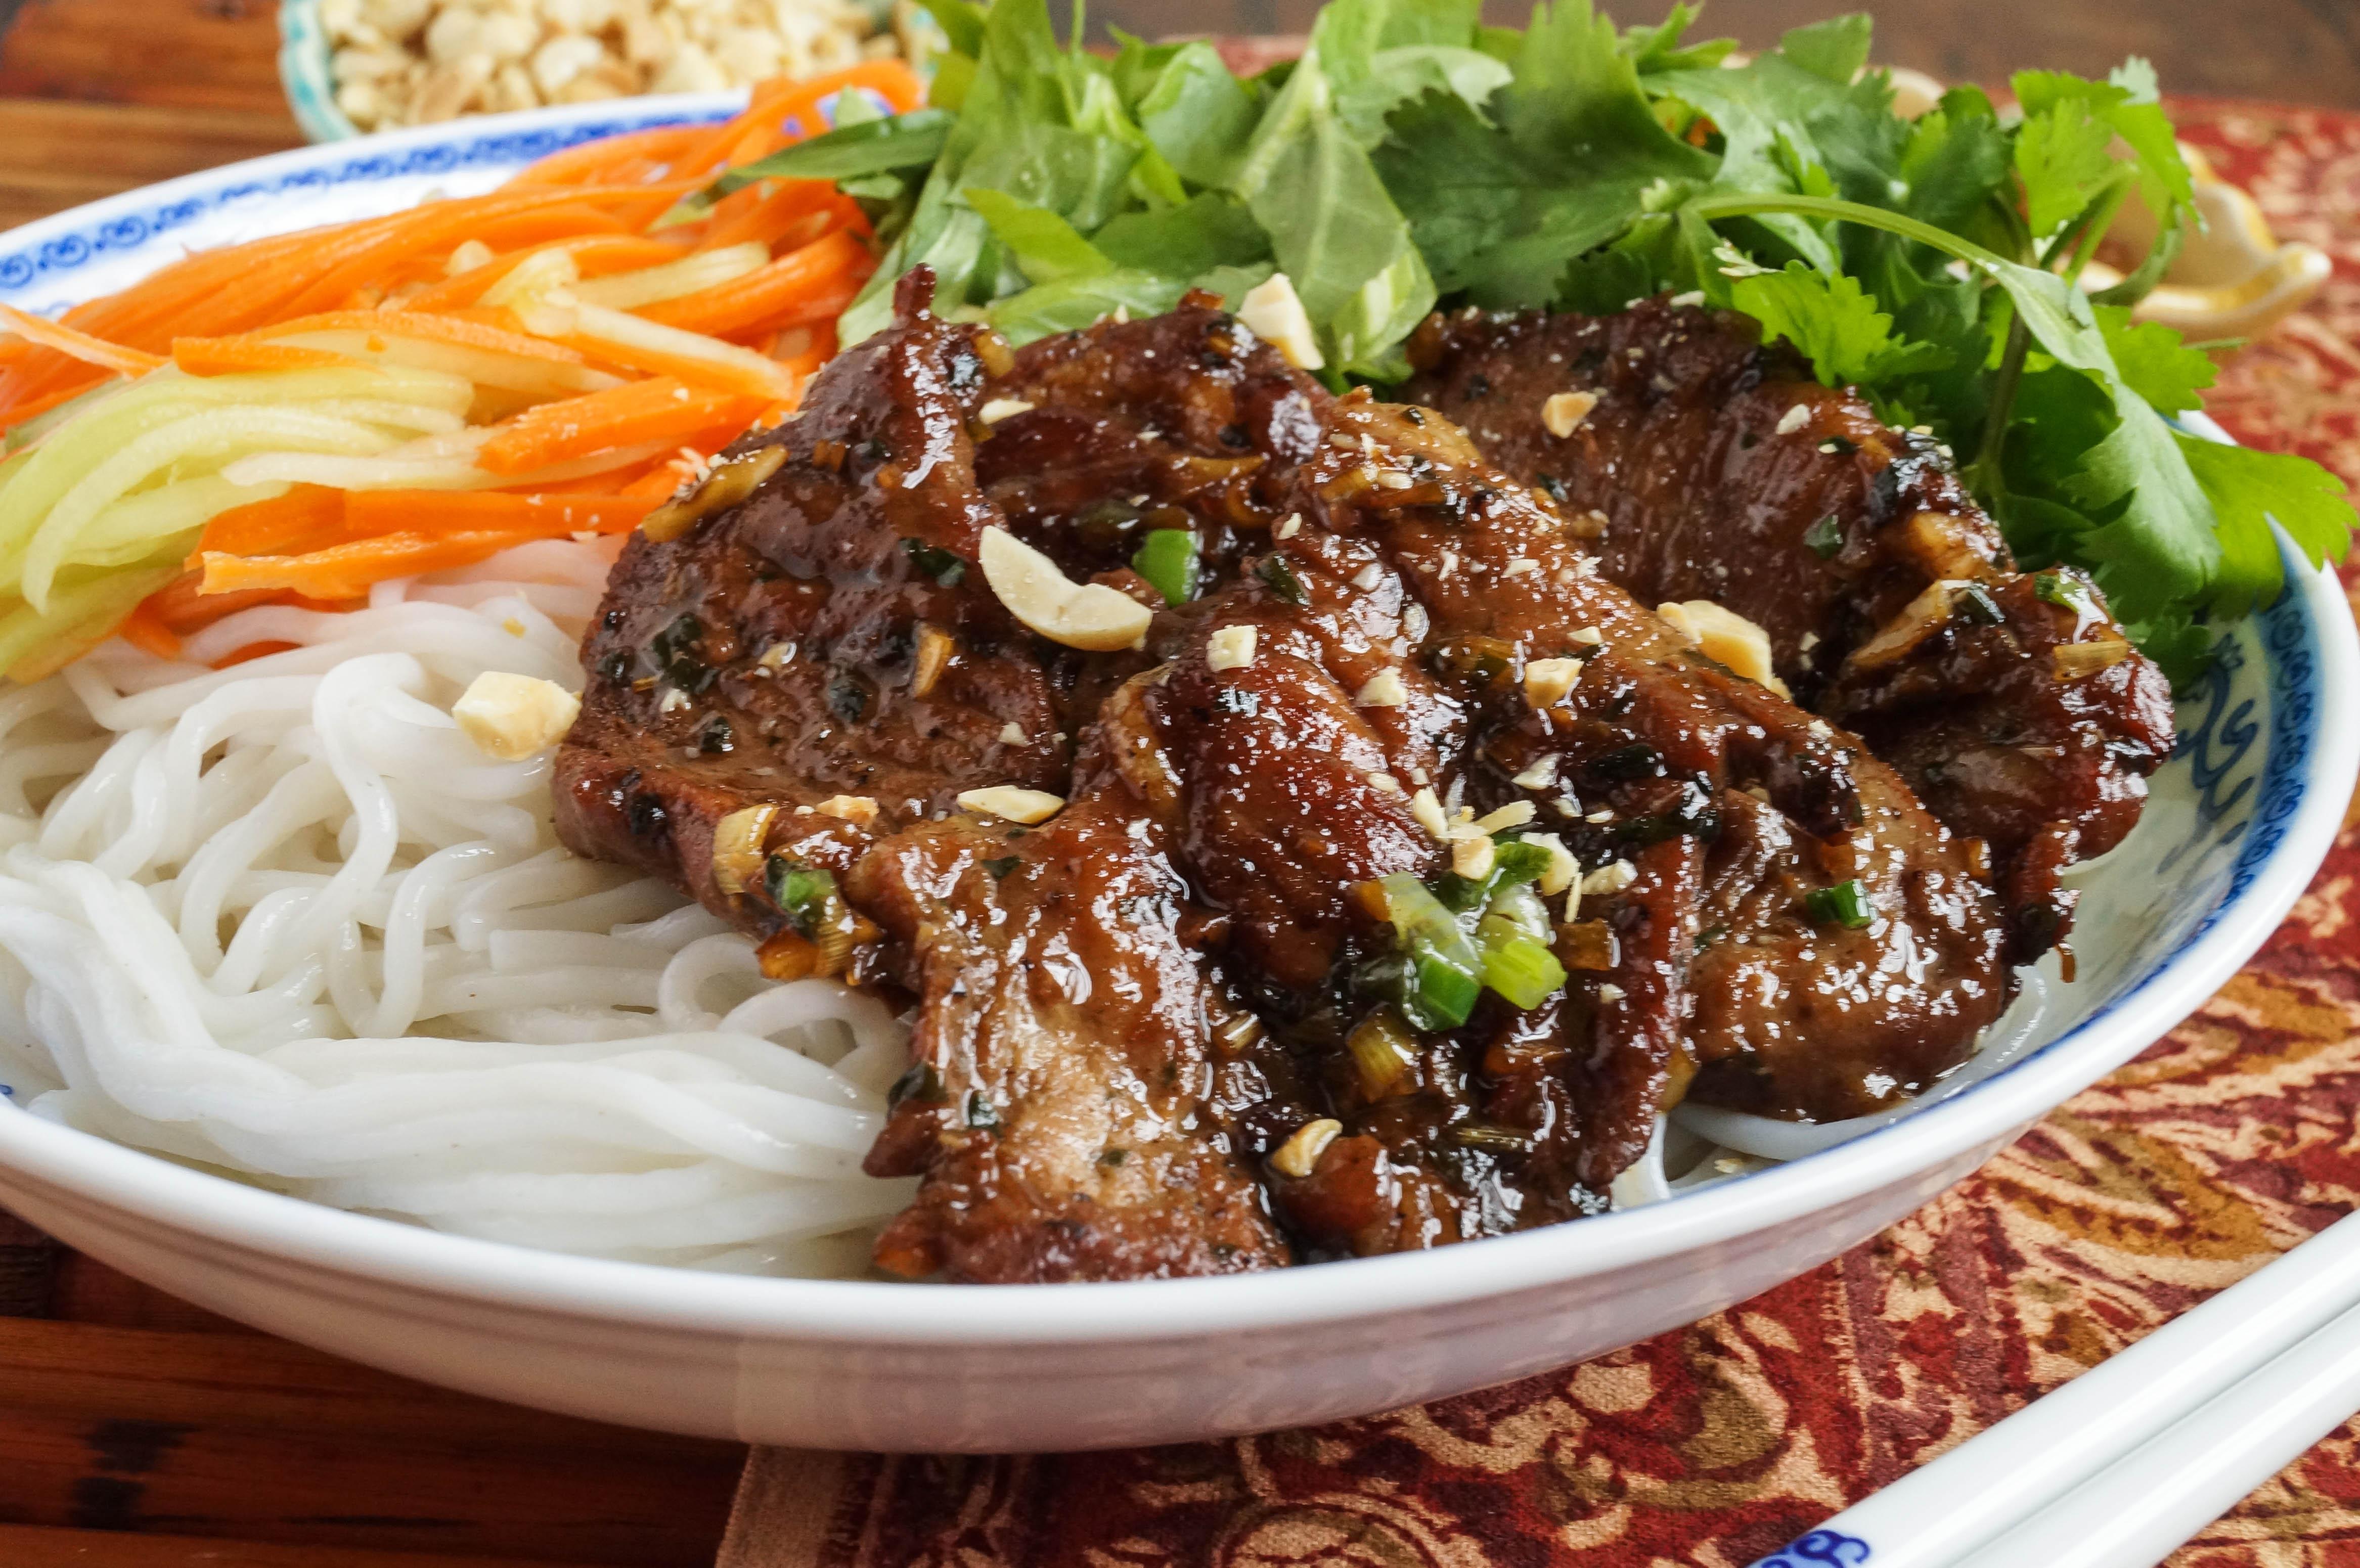 Bún Thịt Nướng (Vietnamese Grilled Pork with Rice Noodles ...